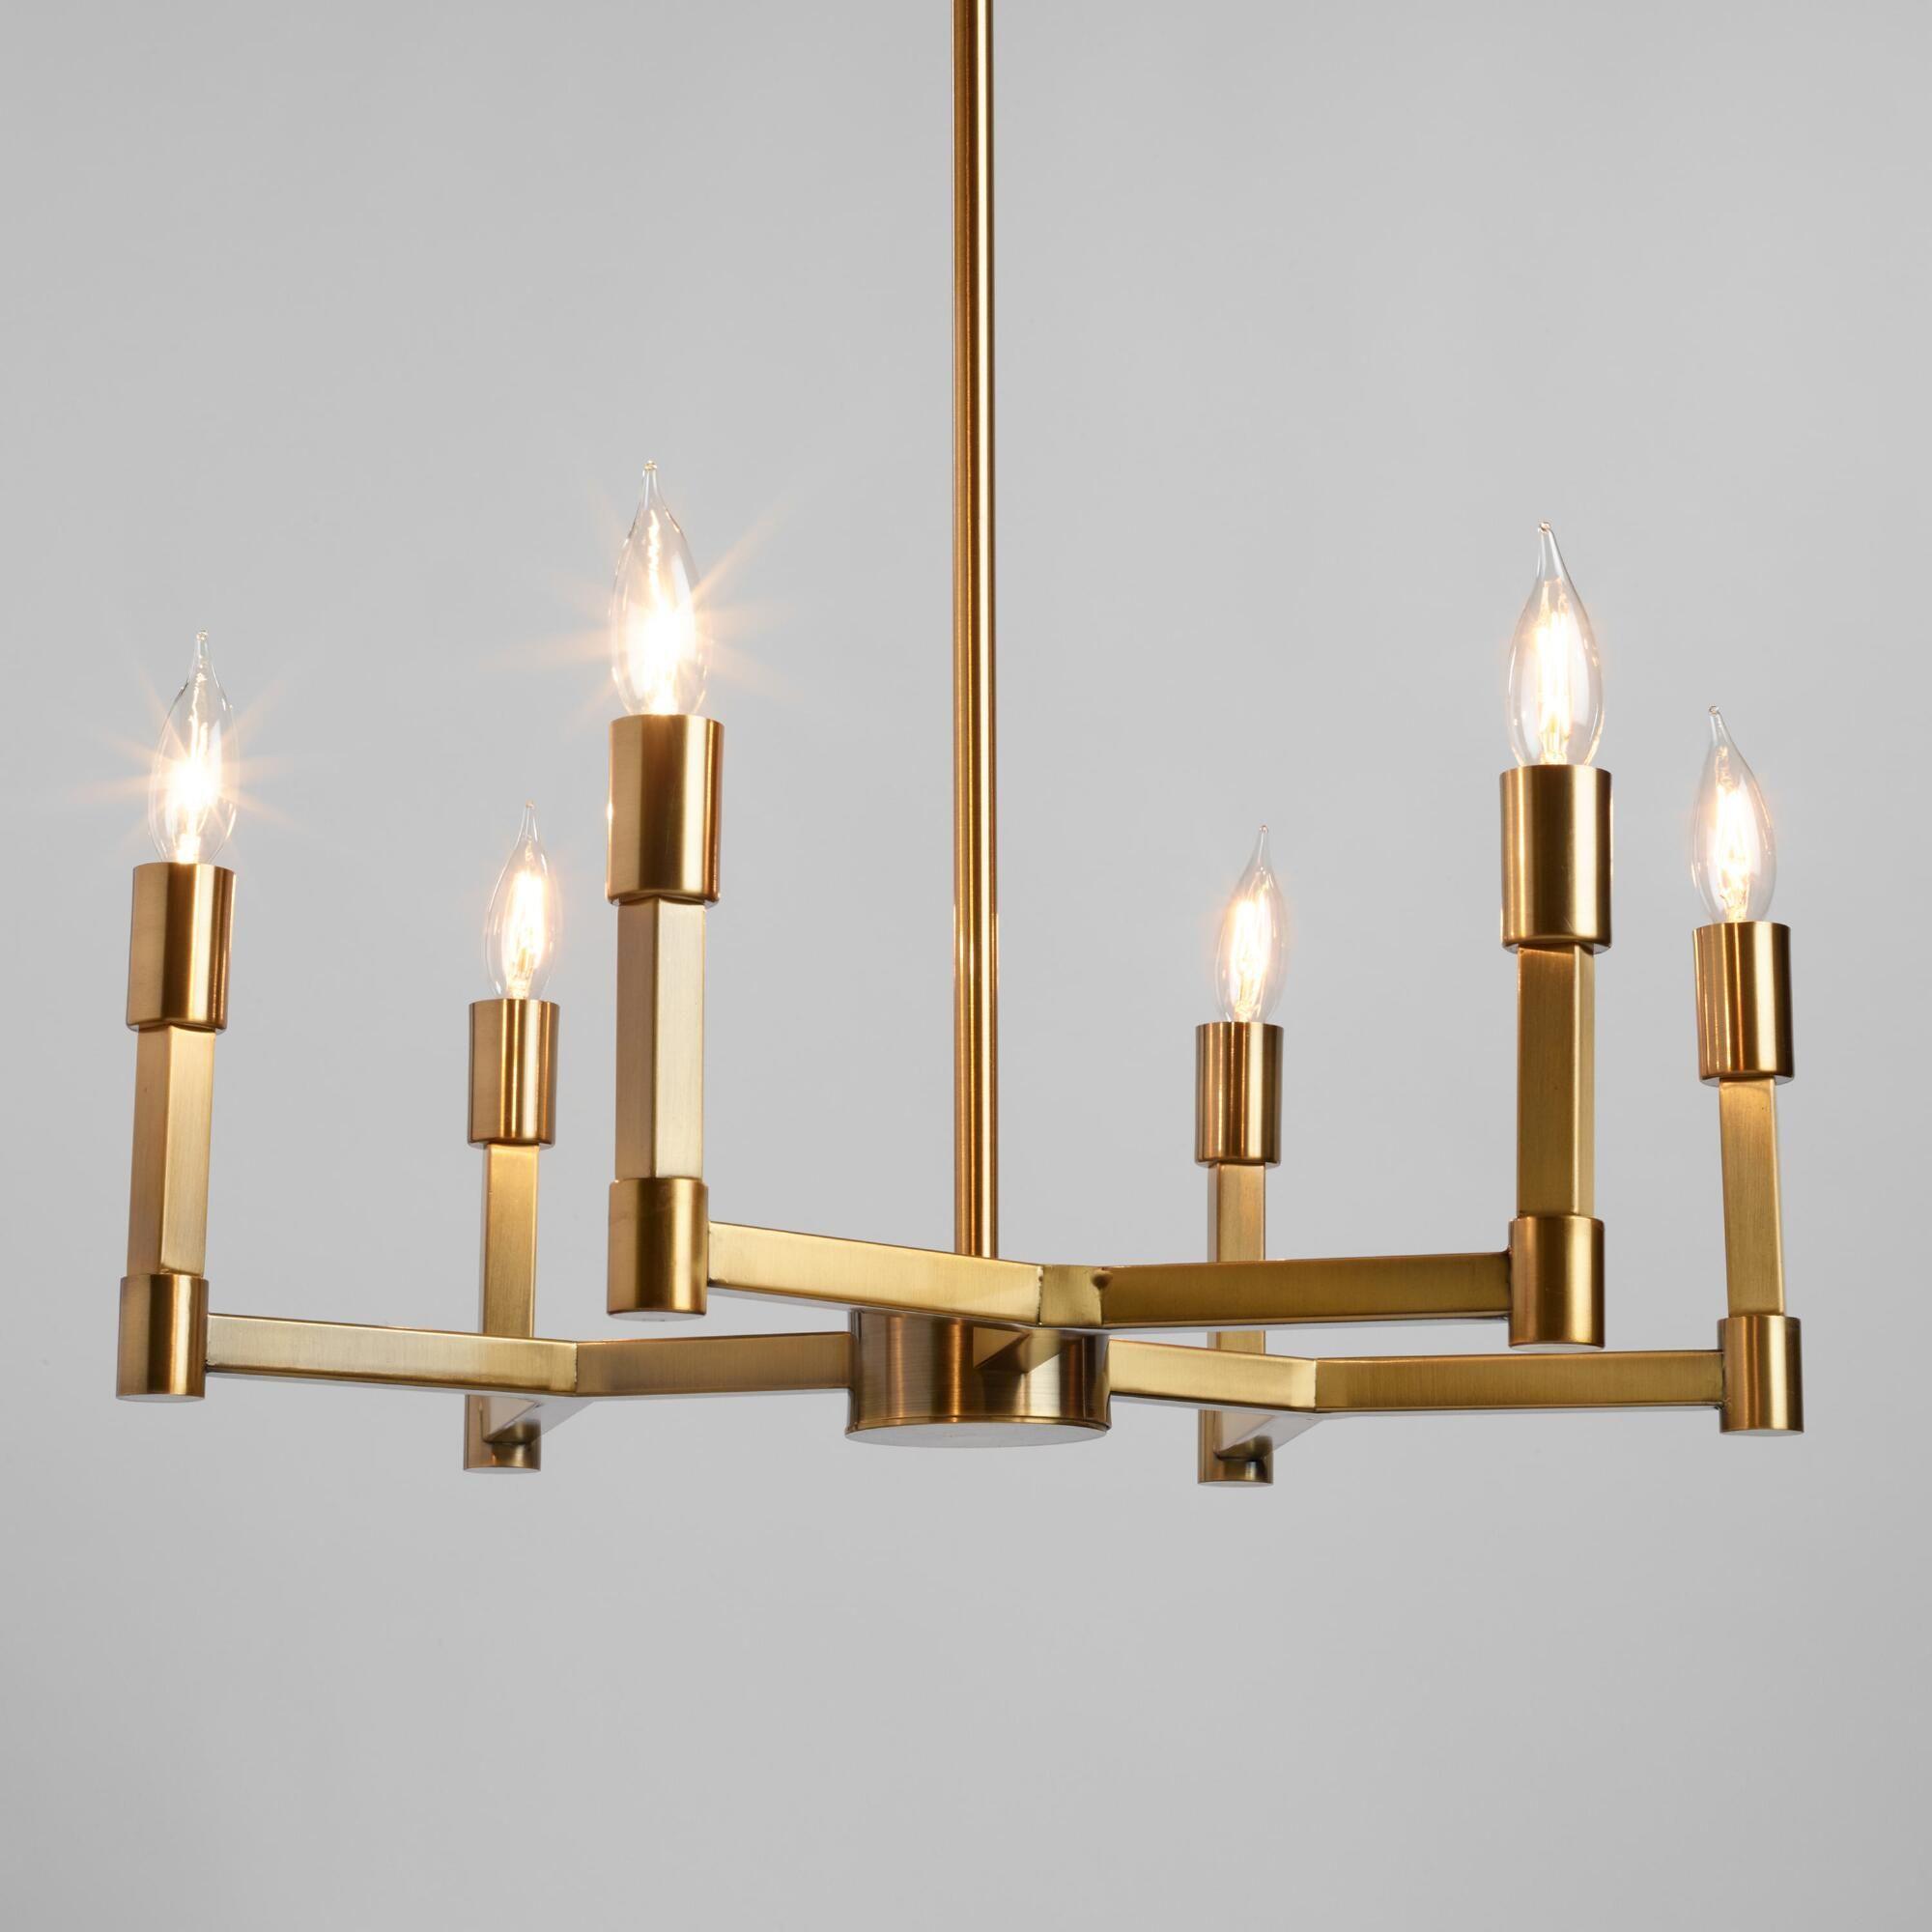 Gold Torch 6 Light Elsa Chandelier Kitchen Lighting Remodel